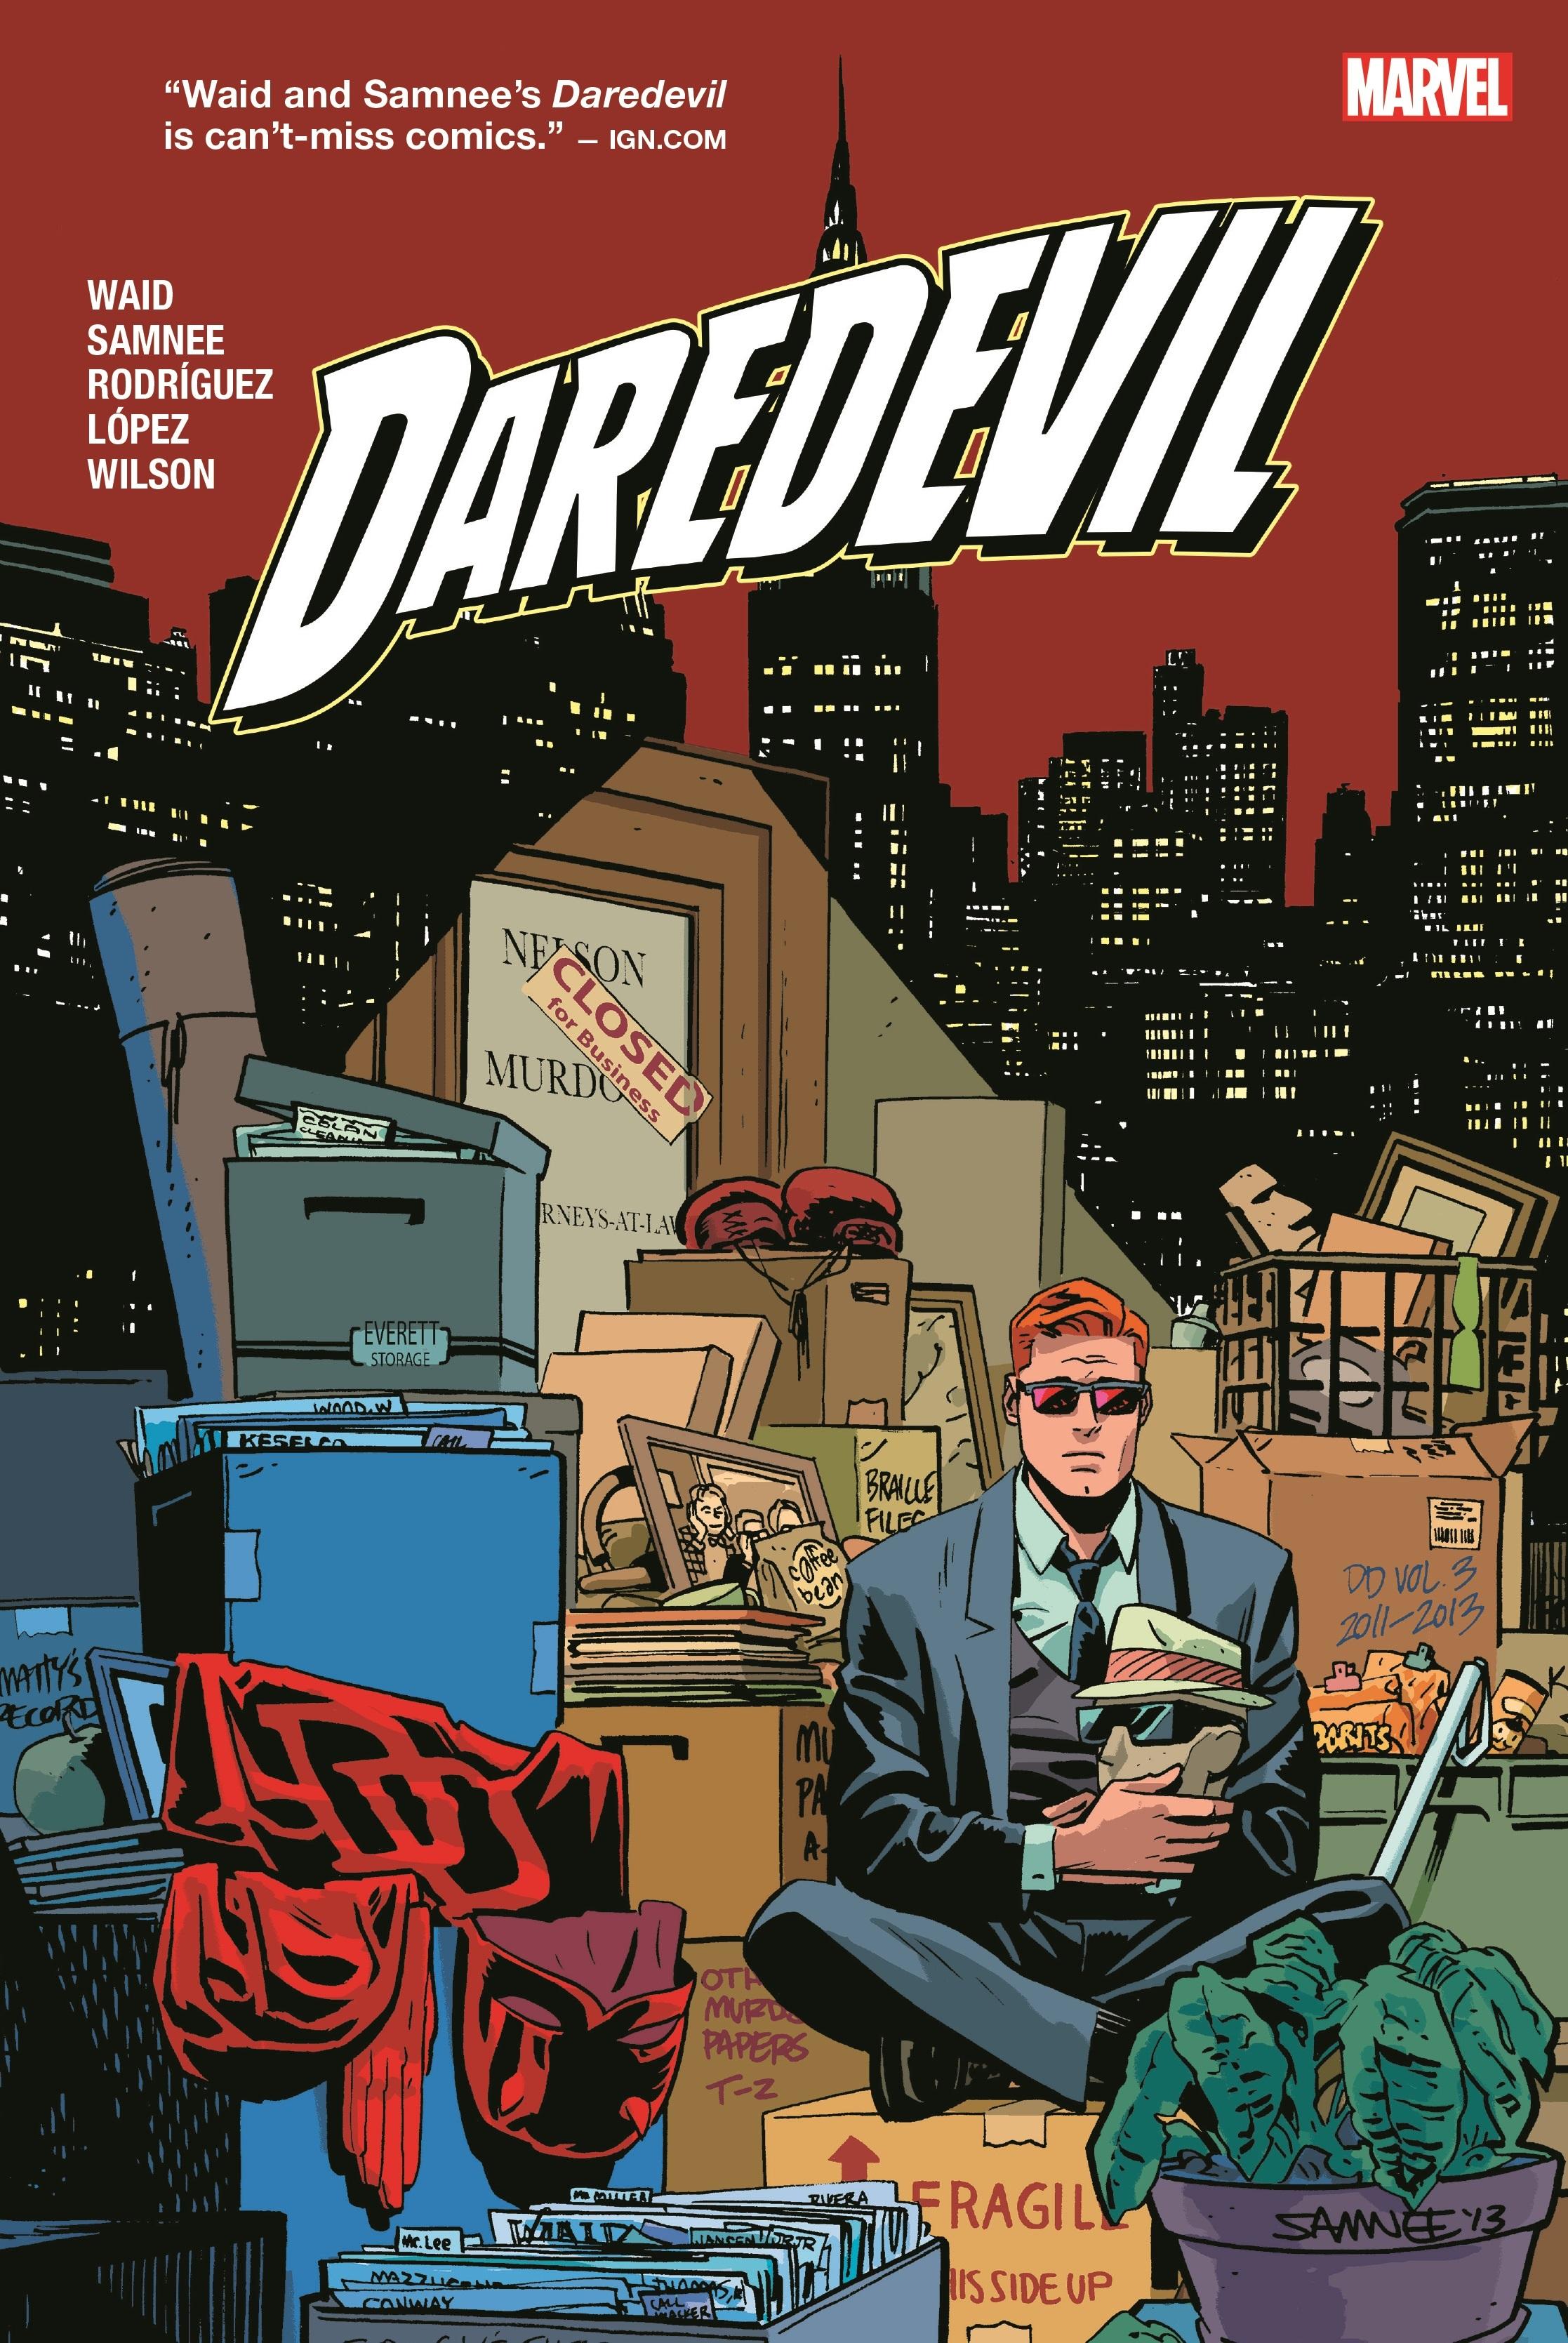 Daredevil by Mark Waid & Chris Samnee Omnibus Vol. 2 (Hardcover)